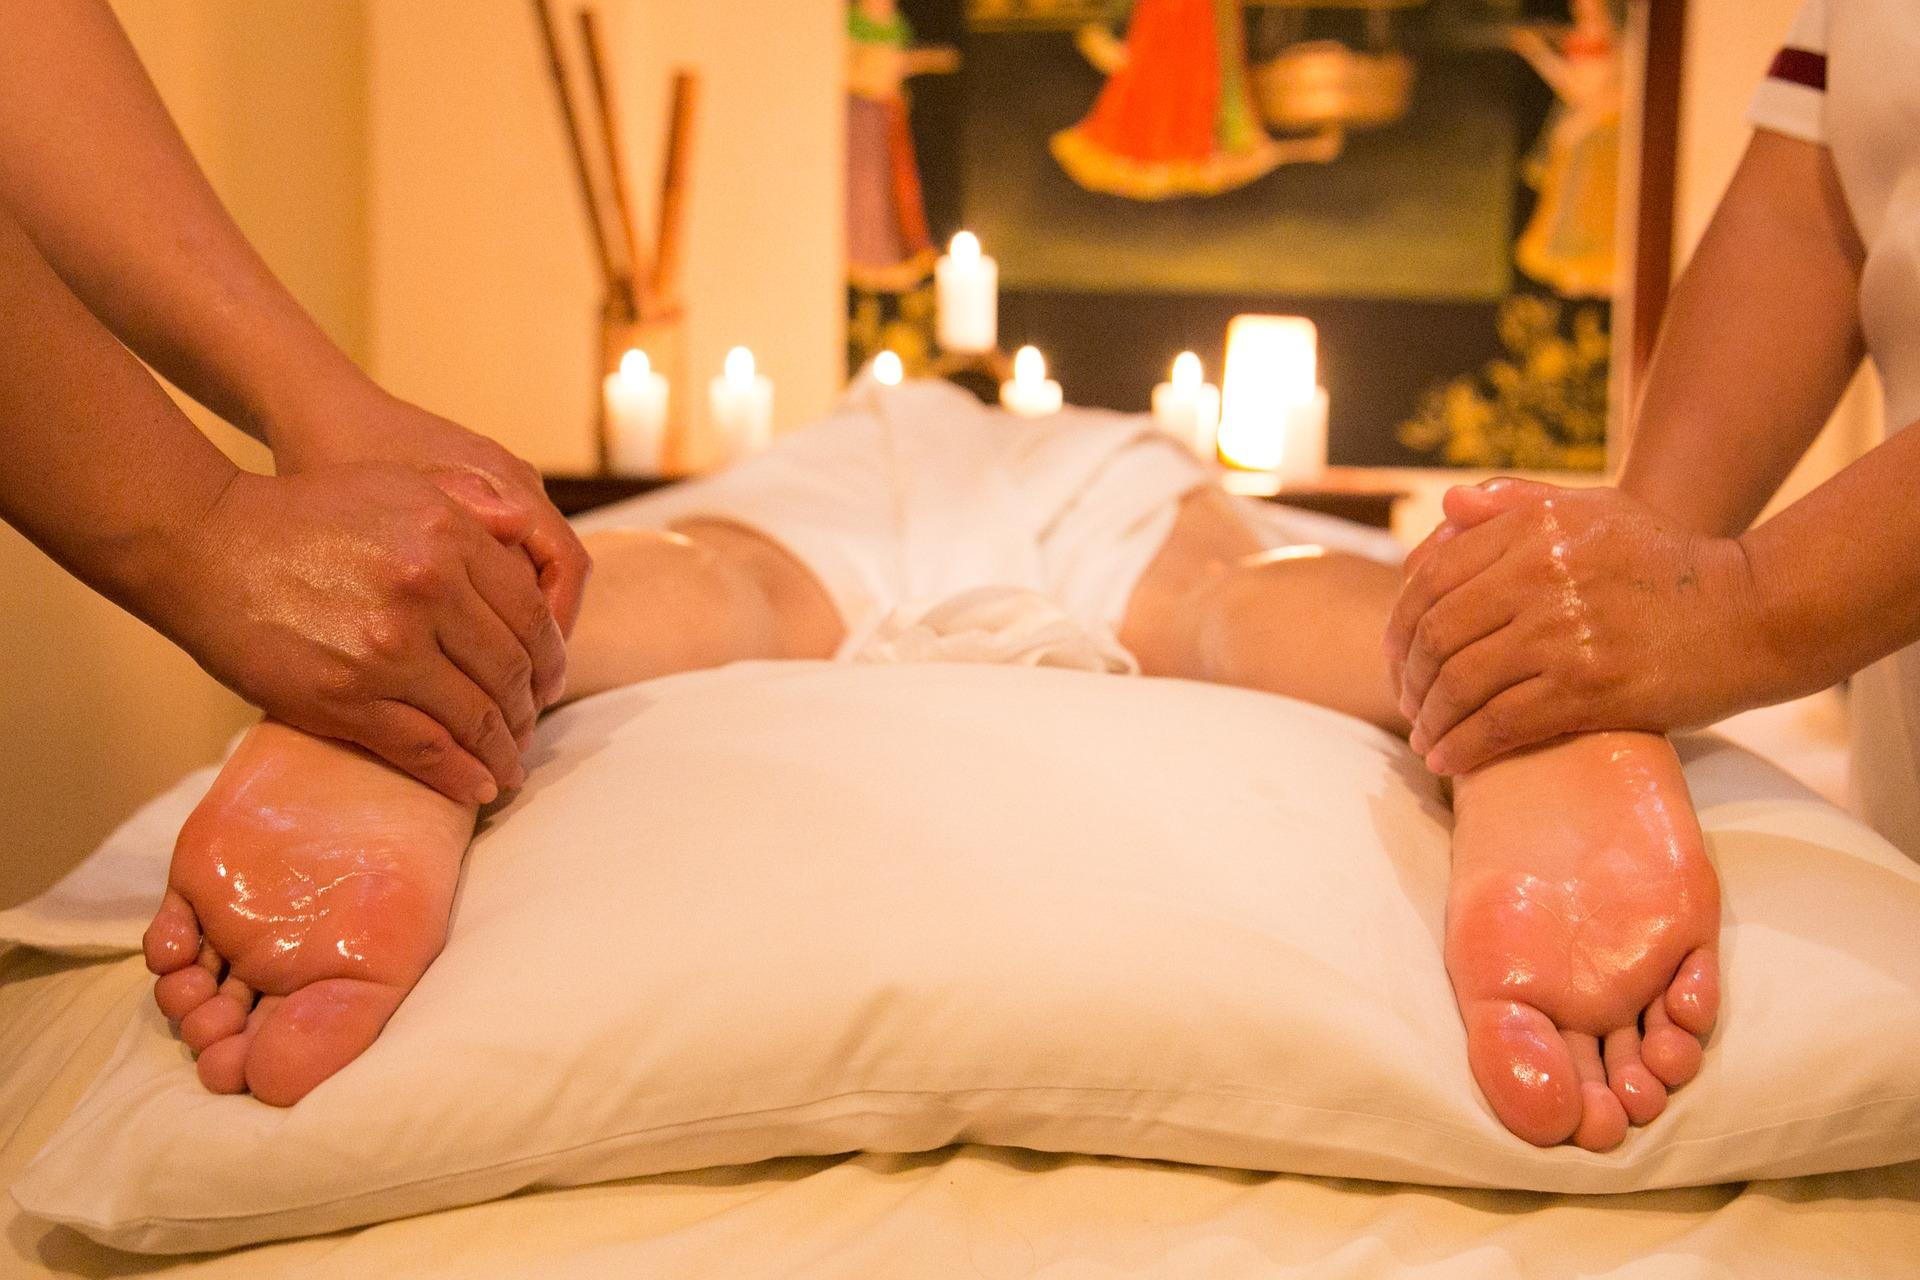 massaggio quattro mani